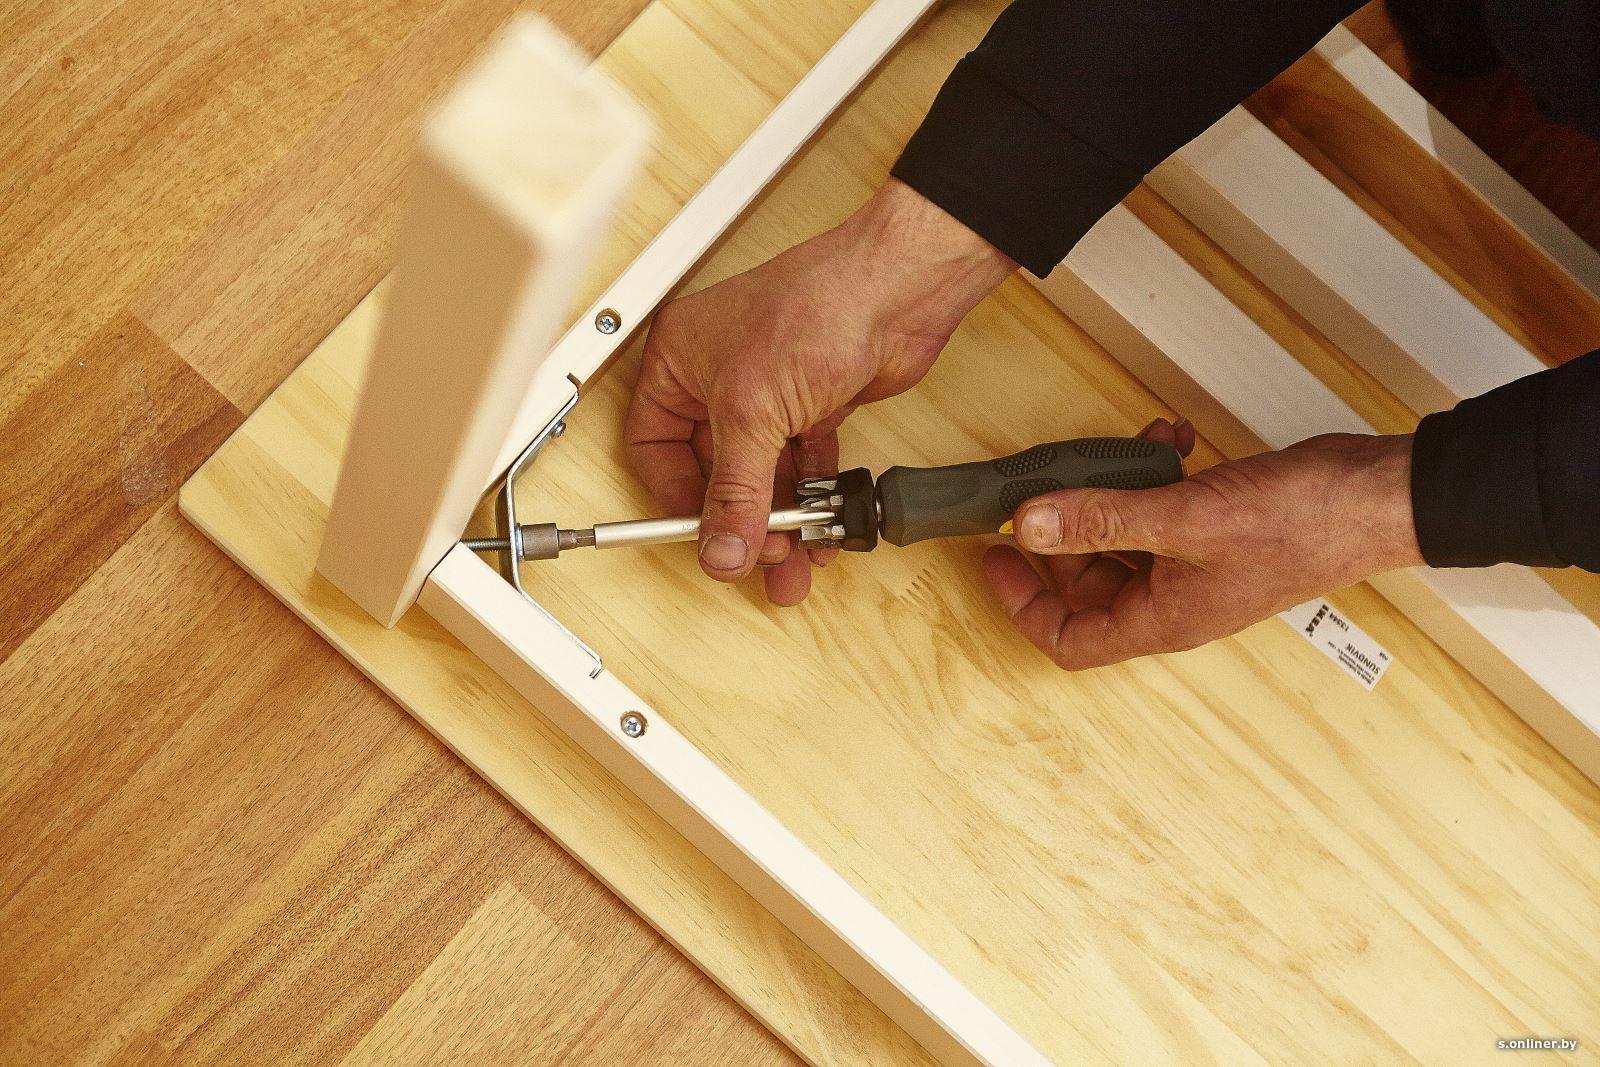 Assembling IKEA tables